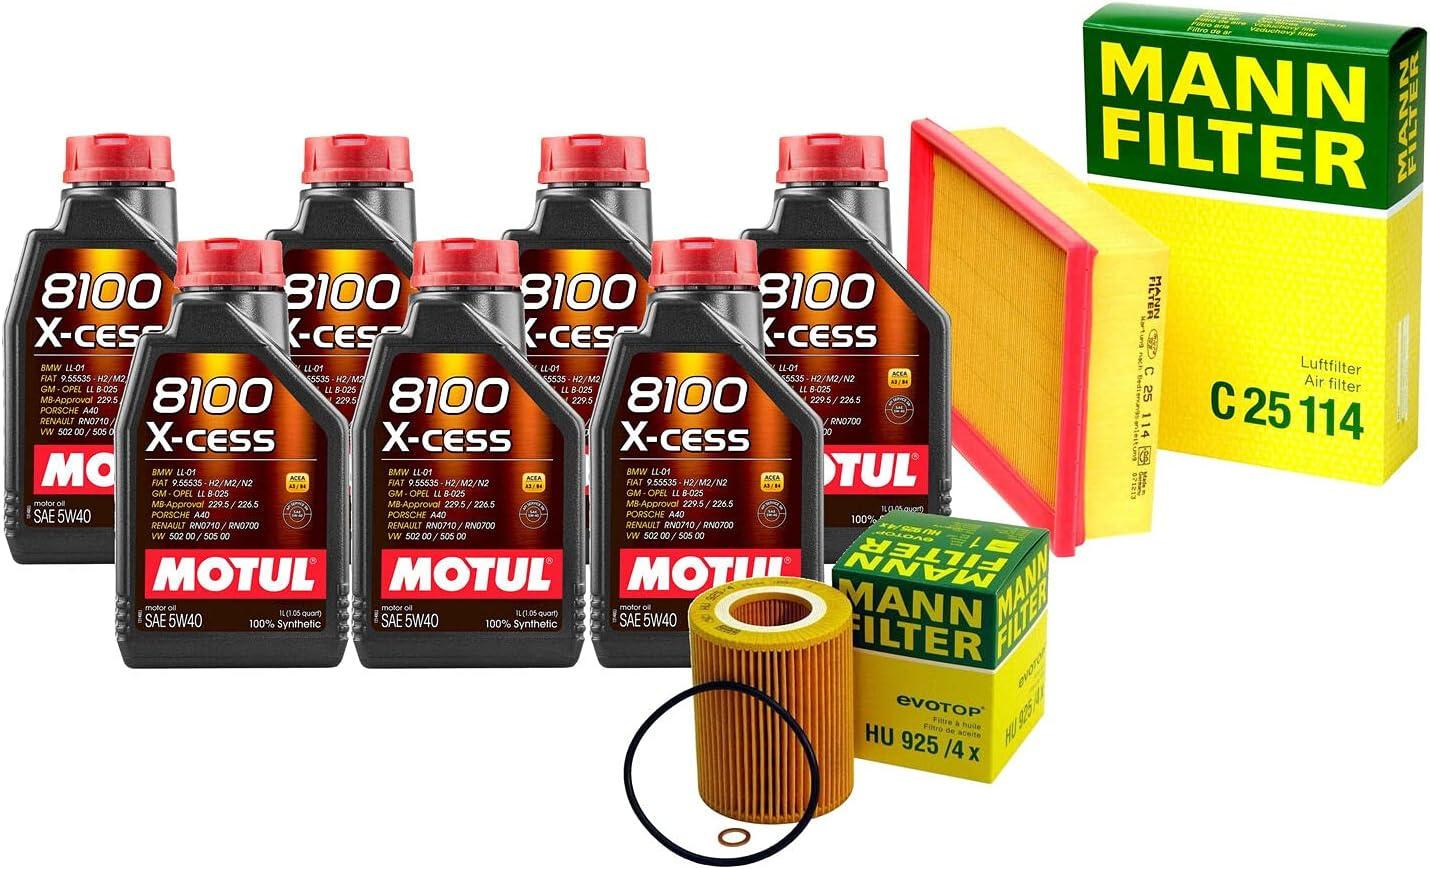 shipfree Over item handling 7L 8100 X-CESS 5W-40 Filter Motor Air E83 Change X3 3.0L kit Oil